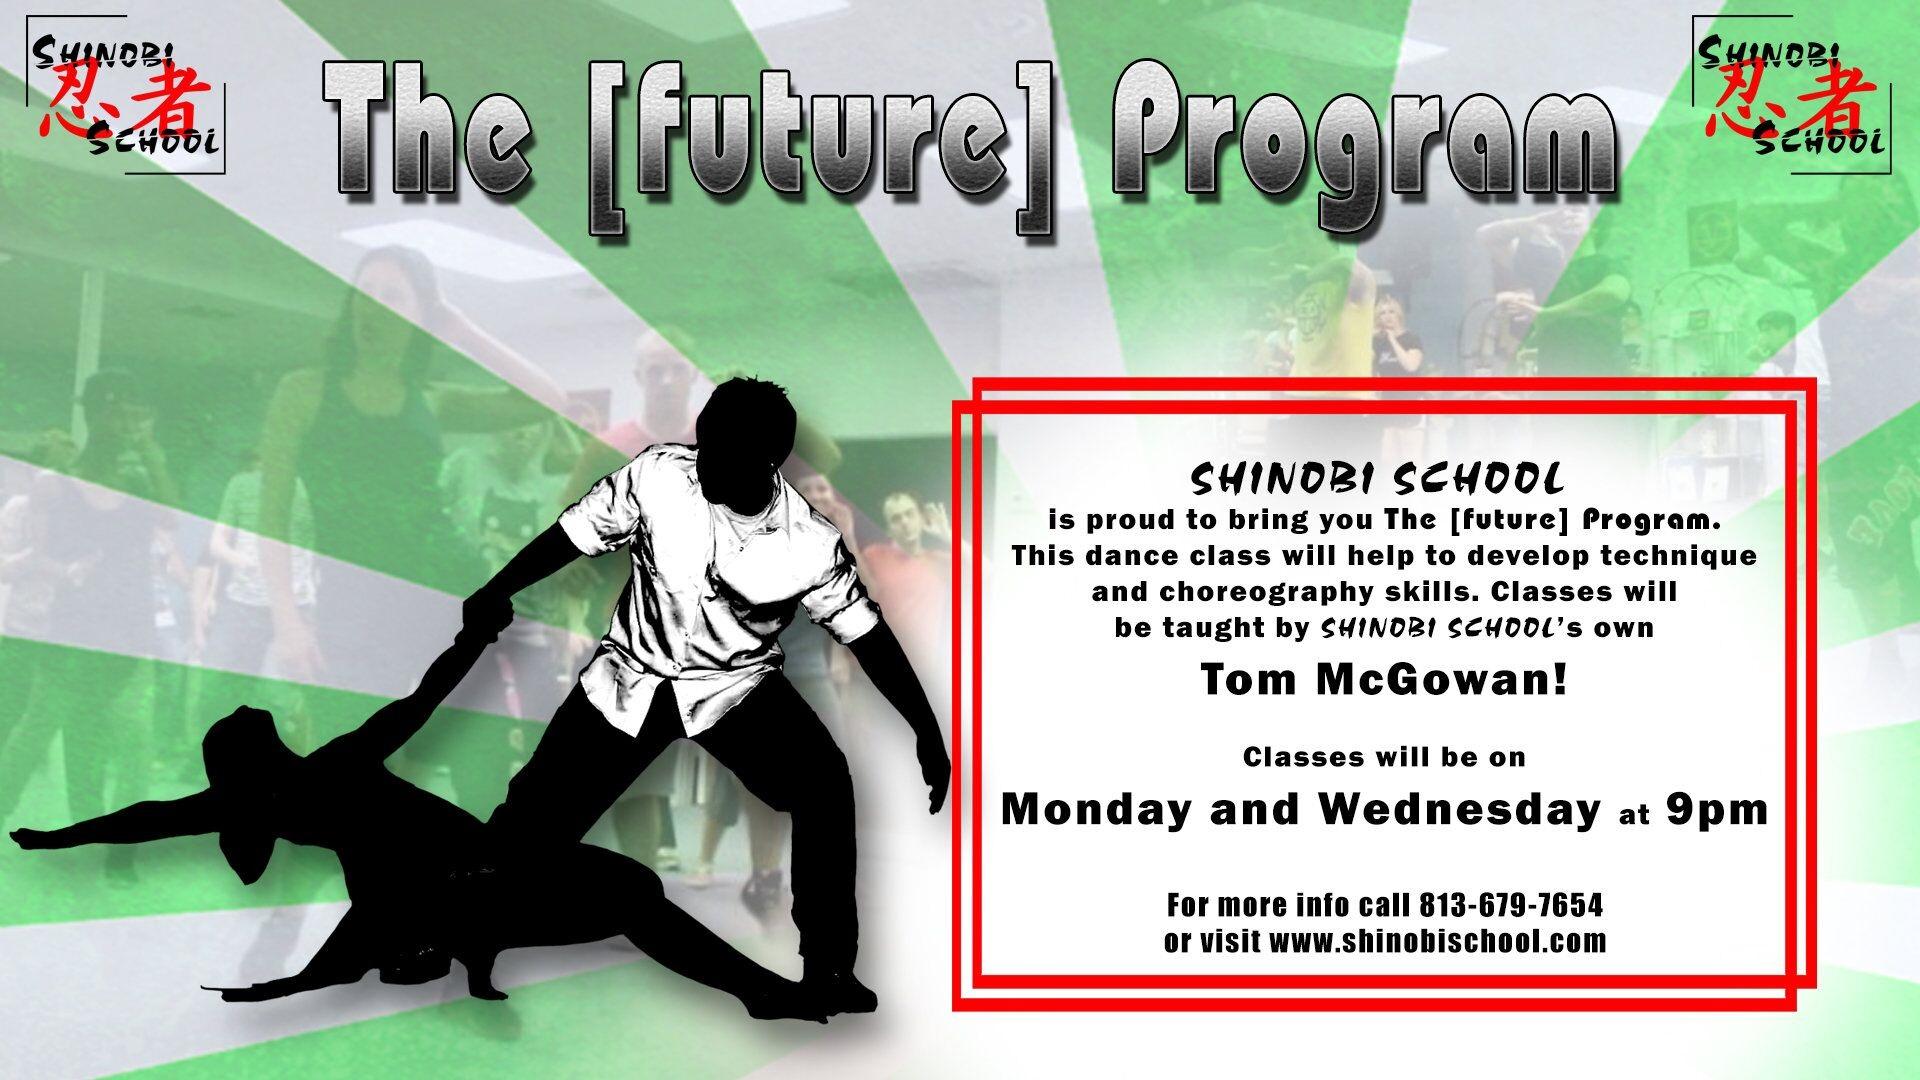 the-future-program-shinobi-school